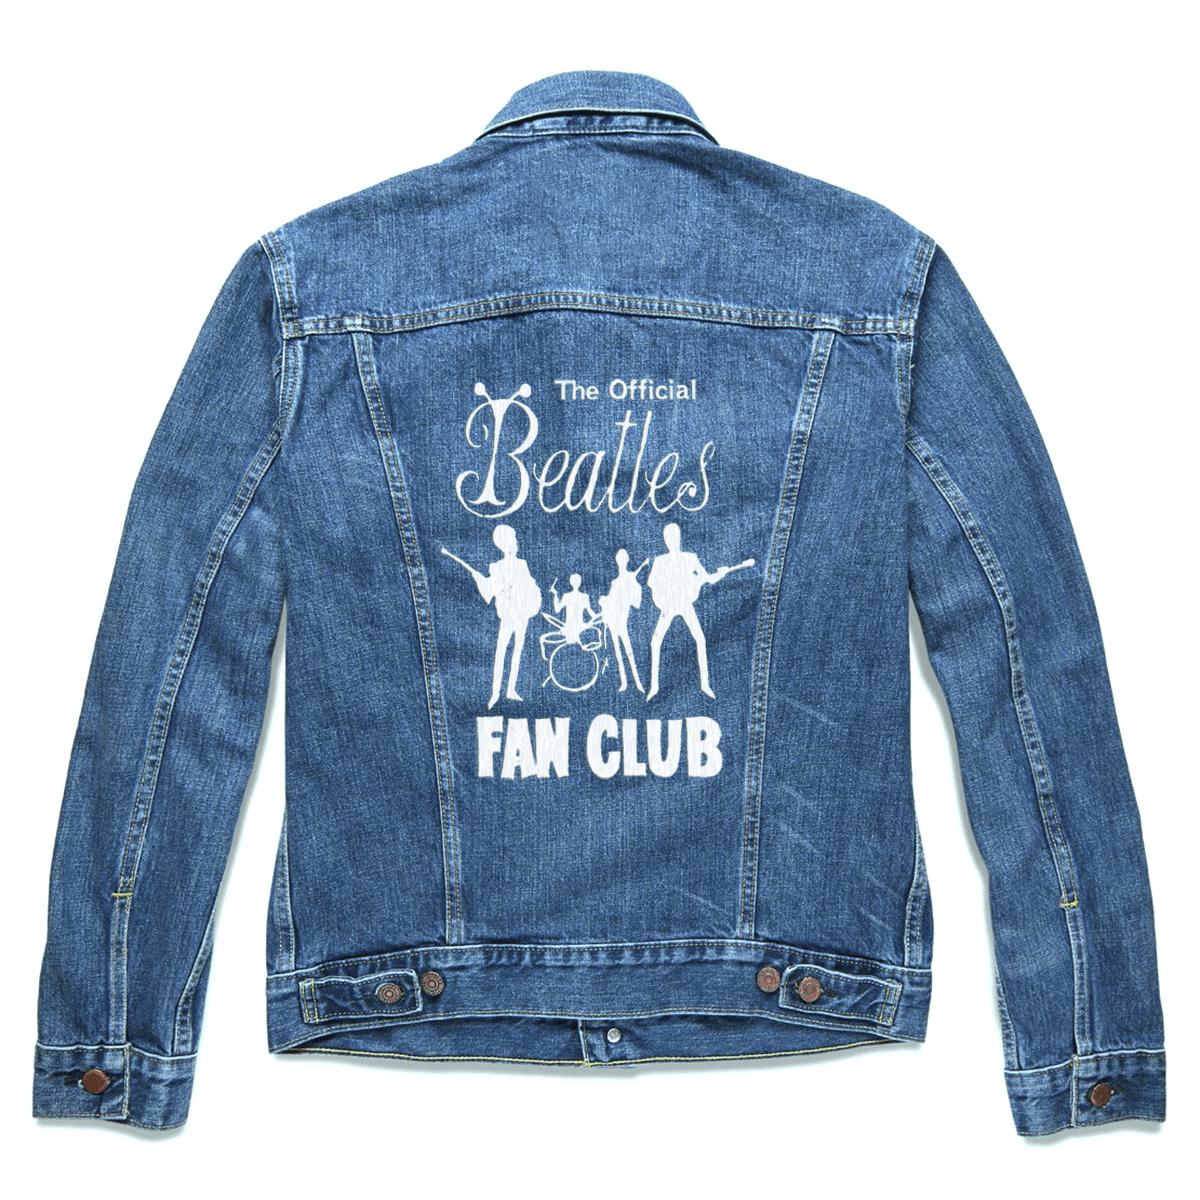 Fan Club Denim Jacket